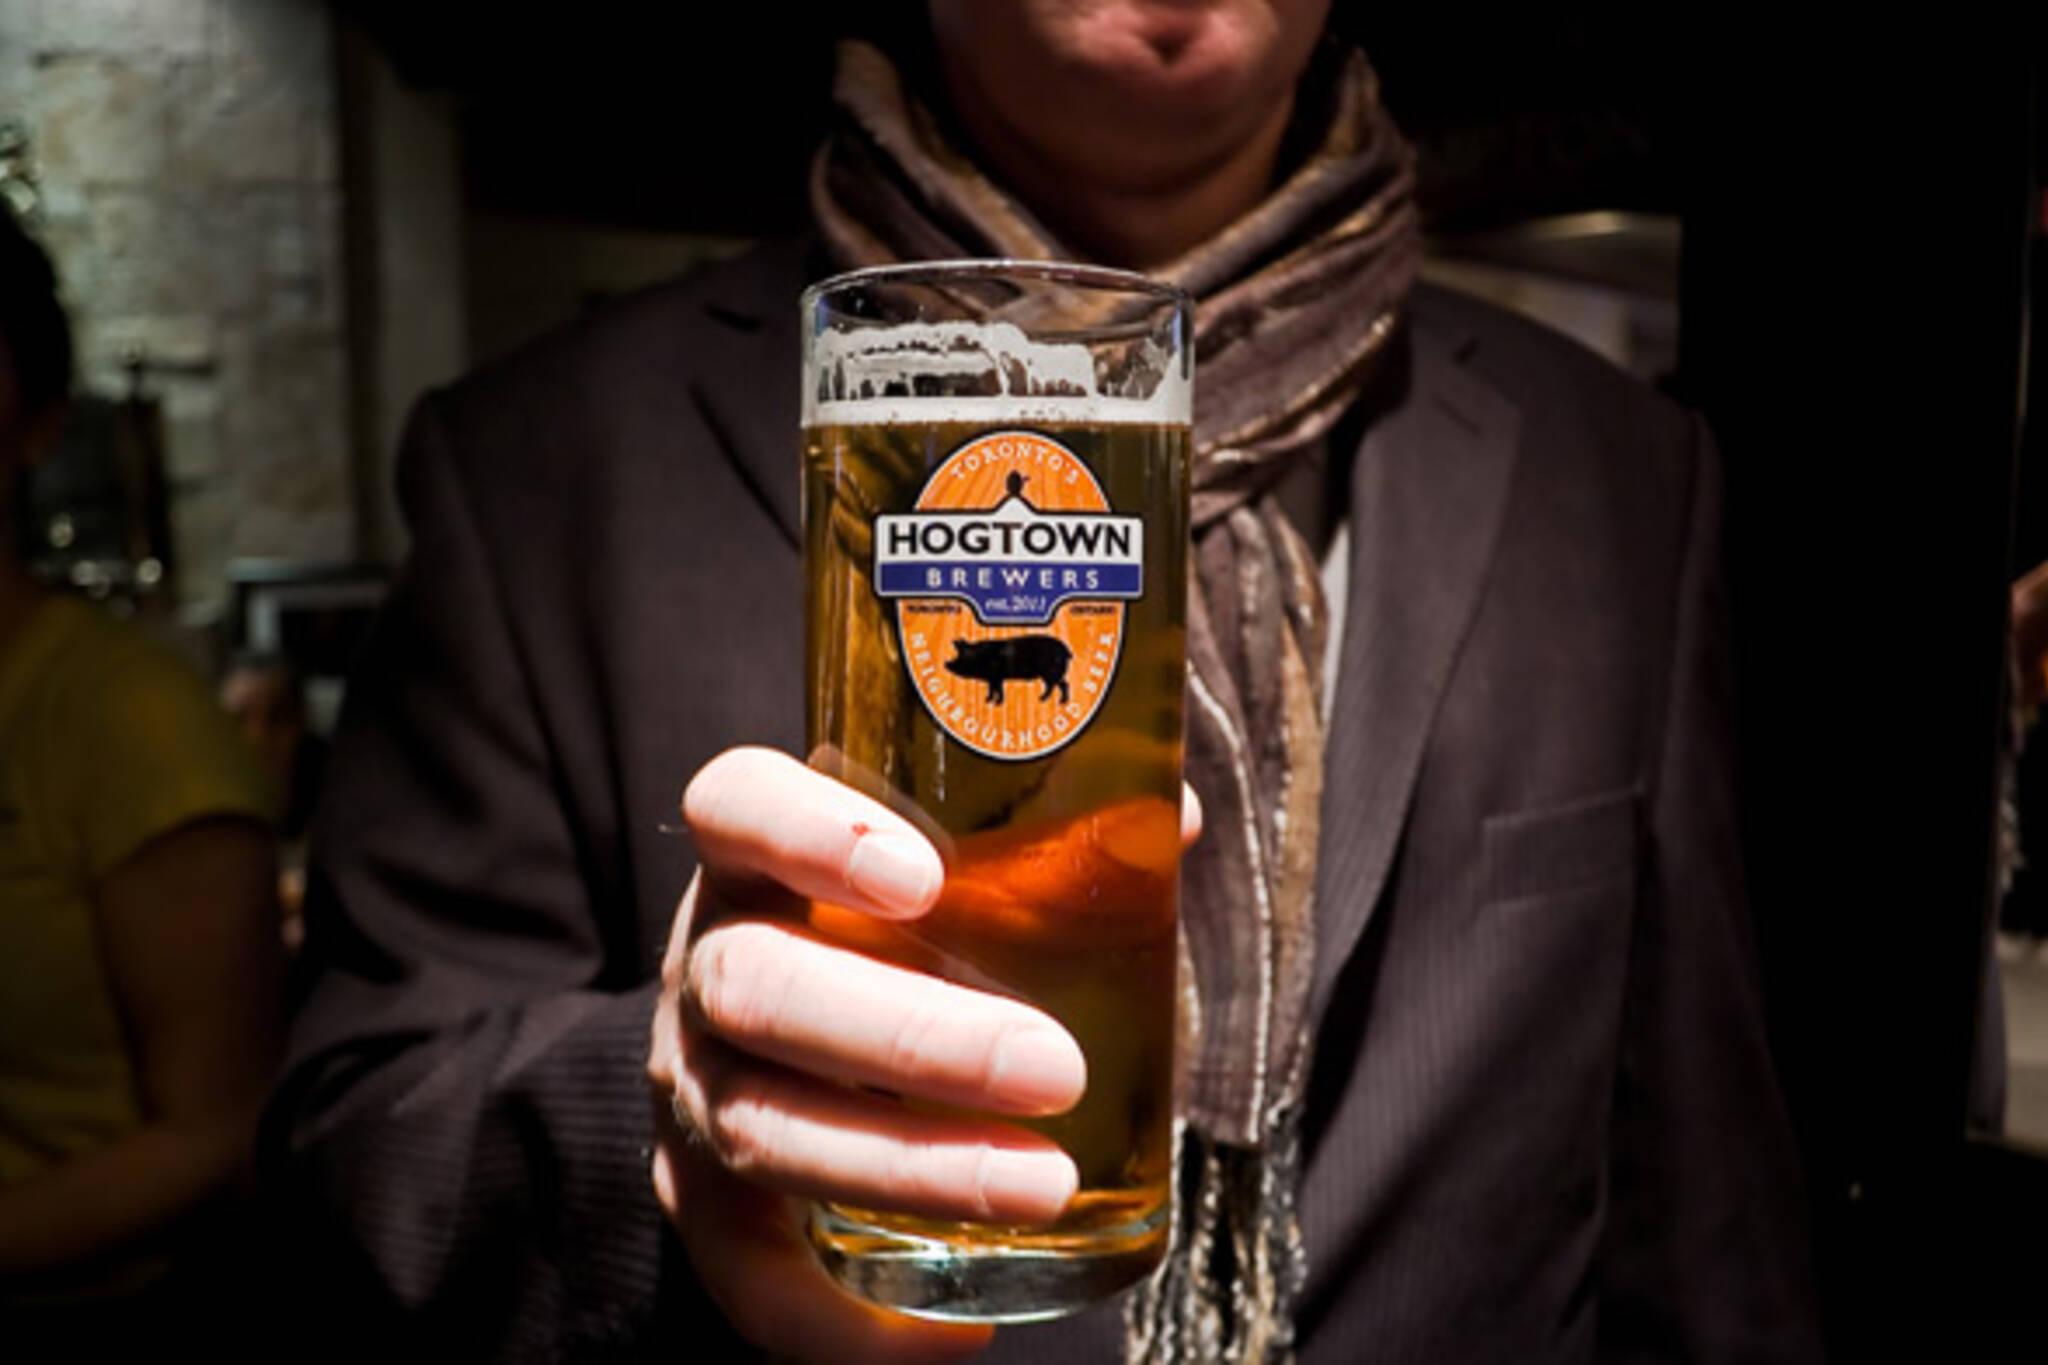 Hogtown Brewers Toronto